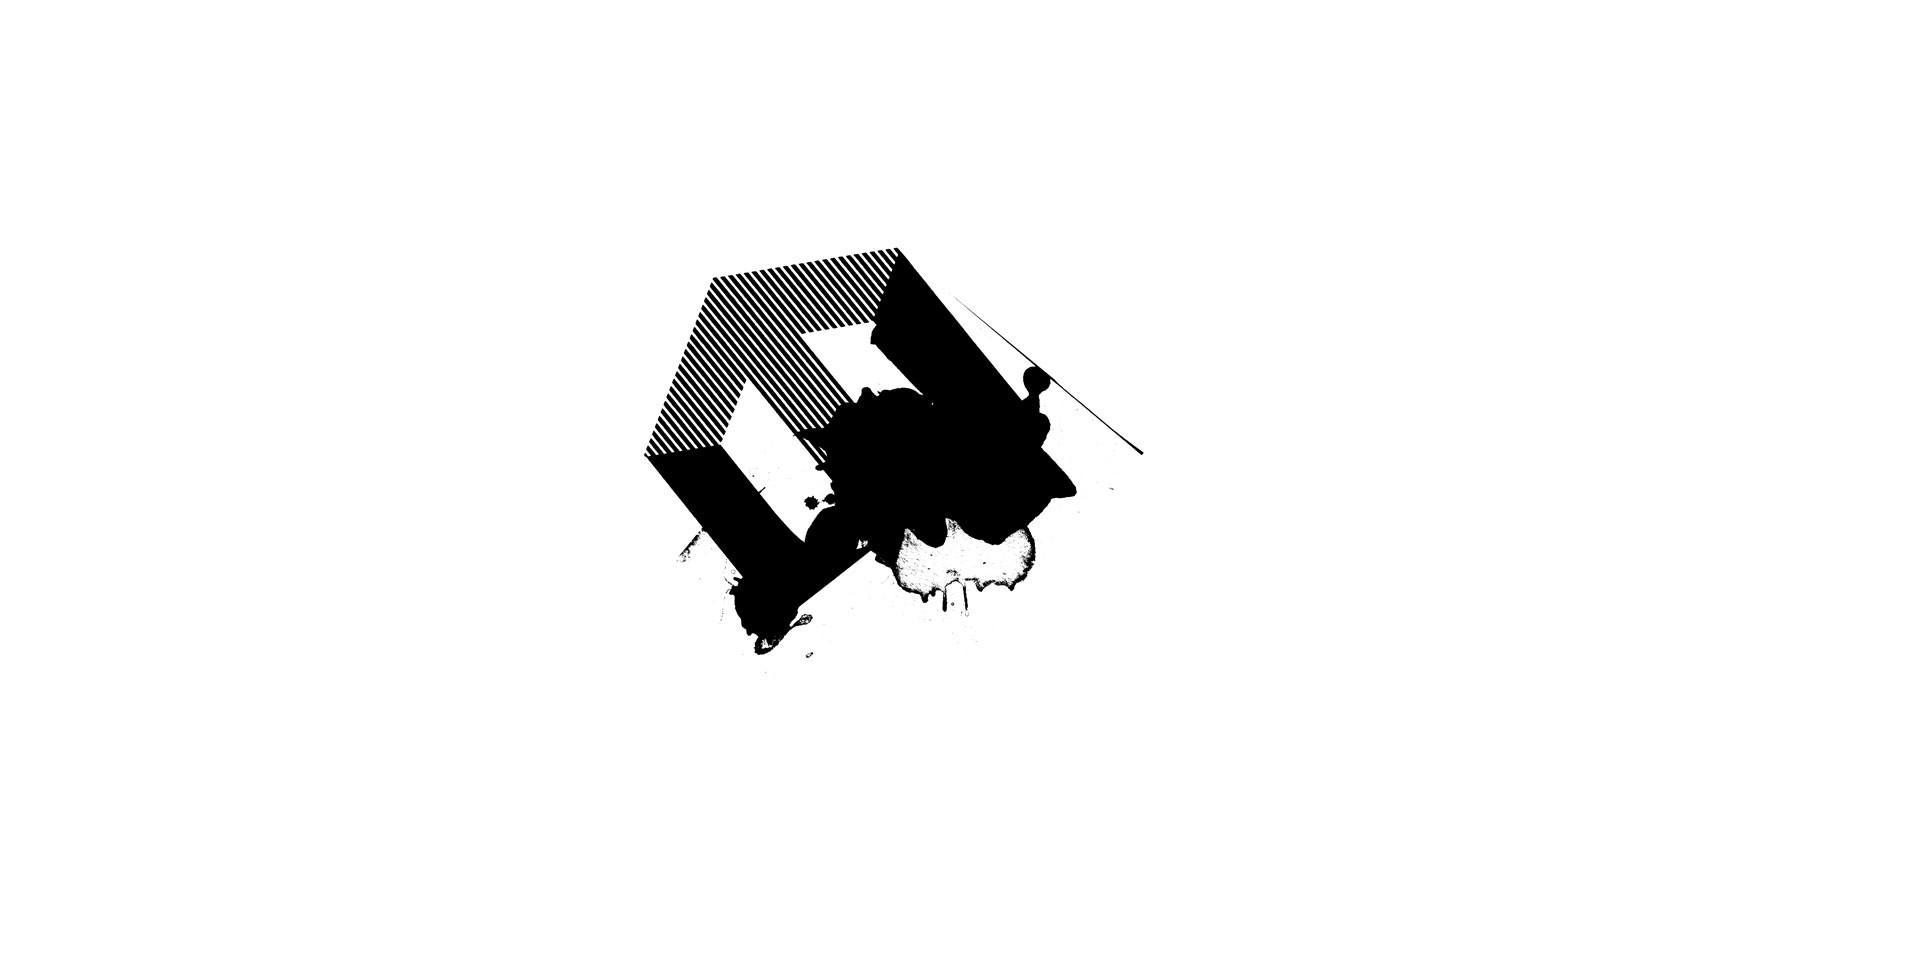 hh-newwhite289-f